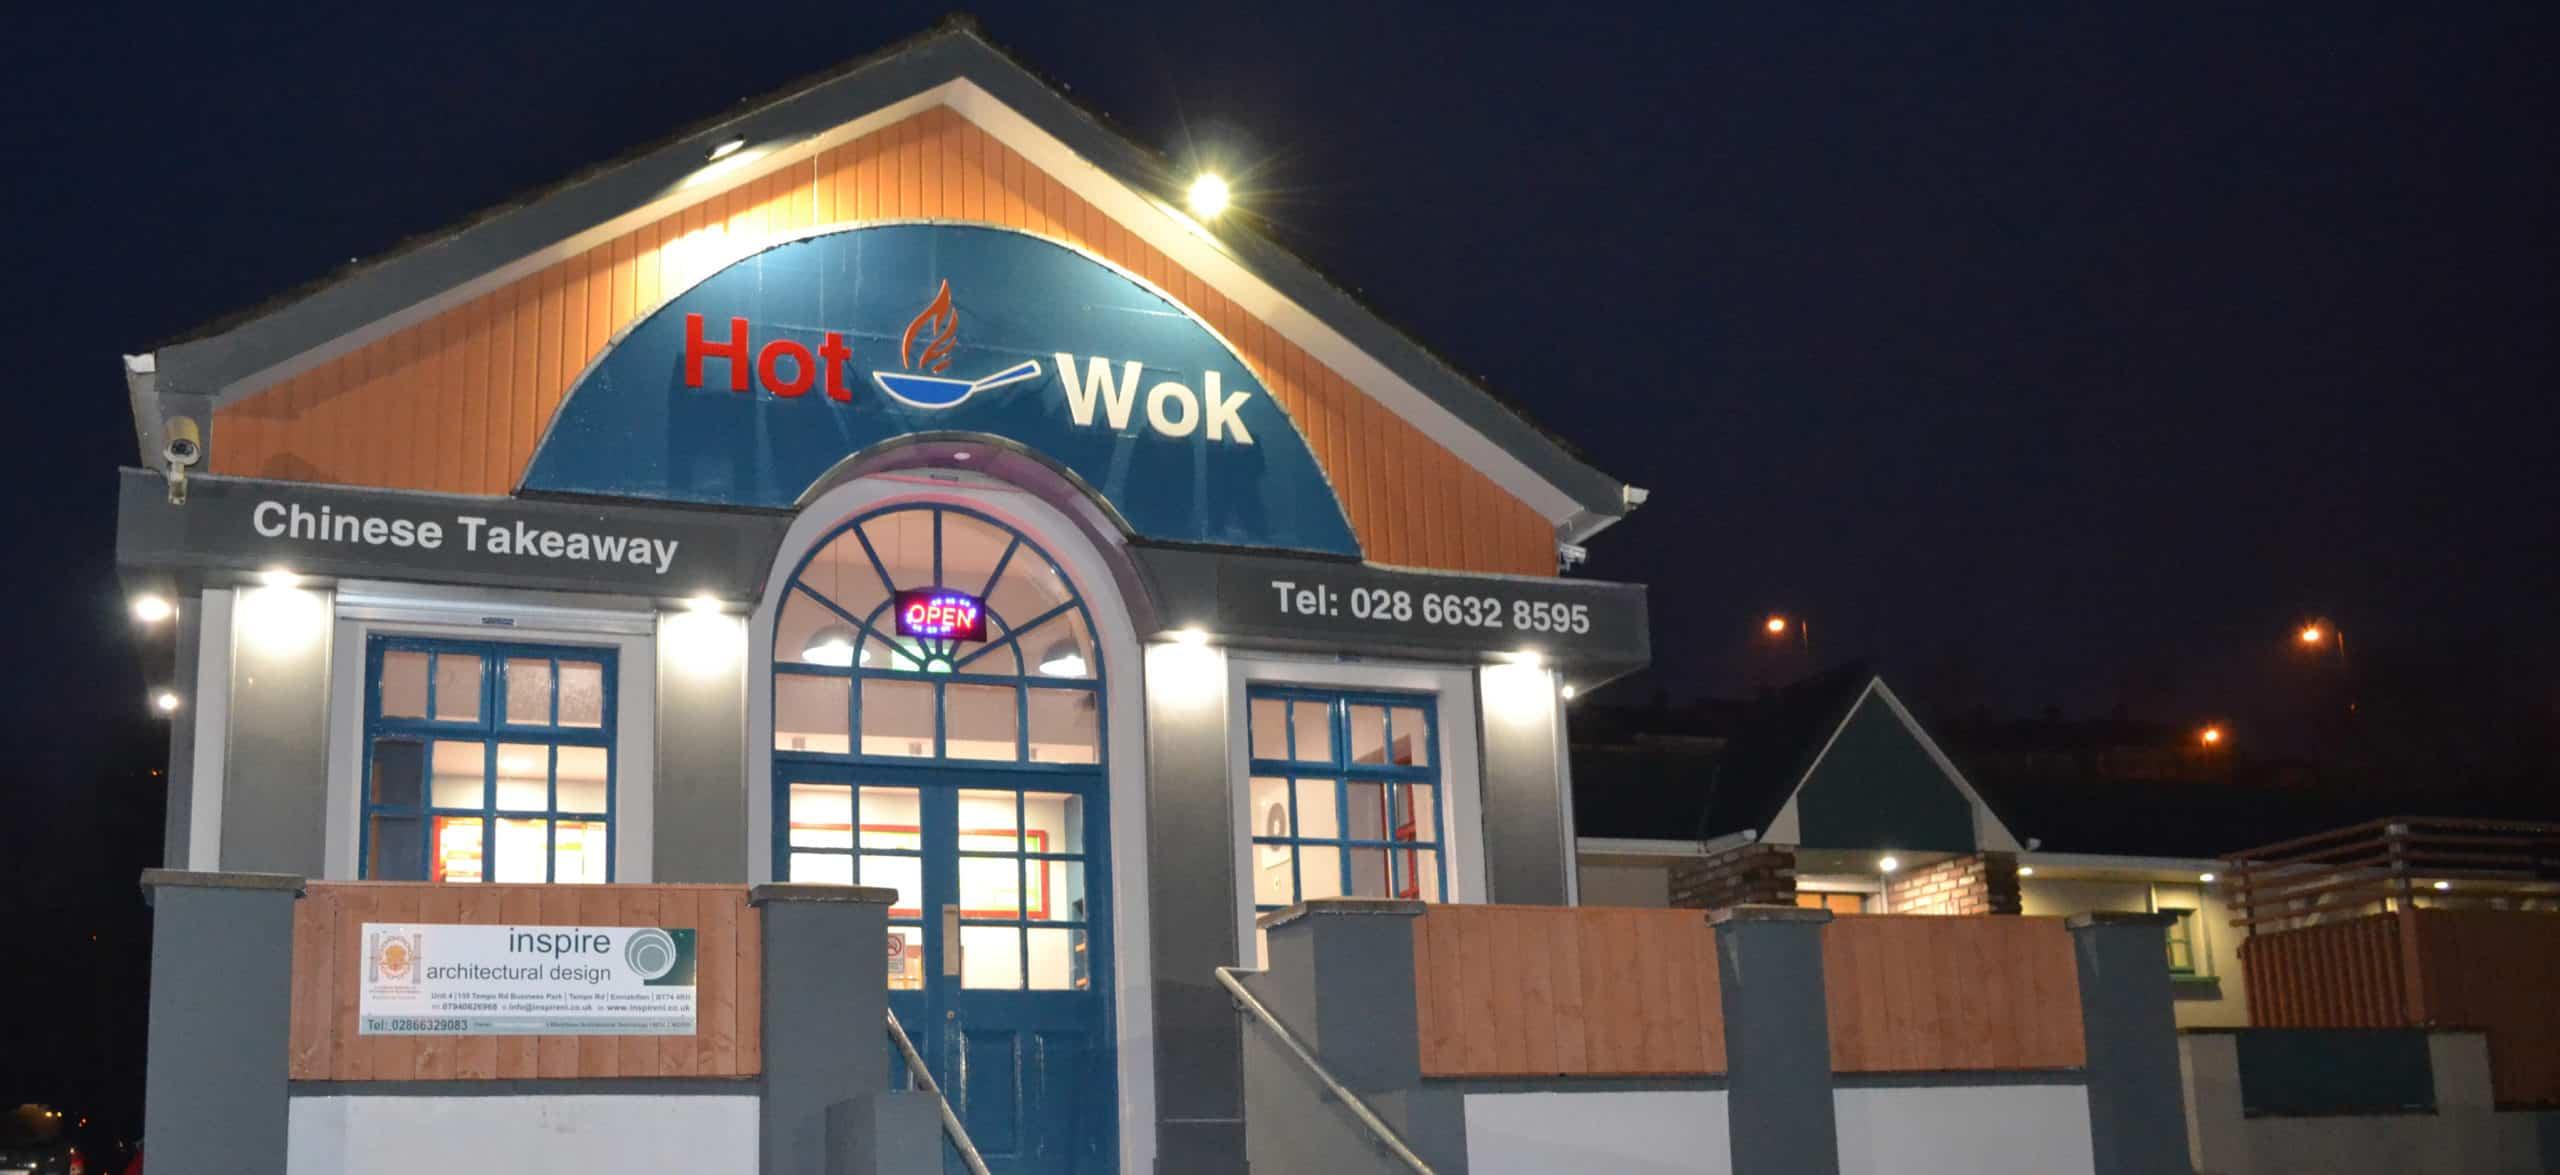 Hot Wok Takeaway Enniskillen - External